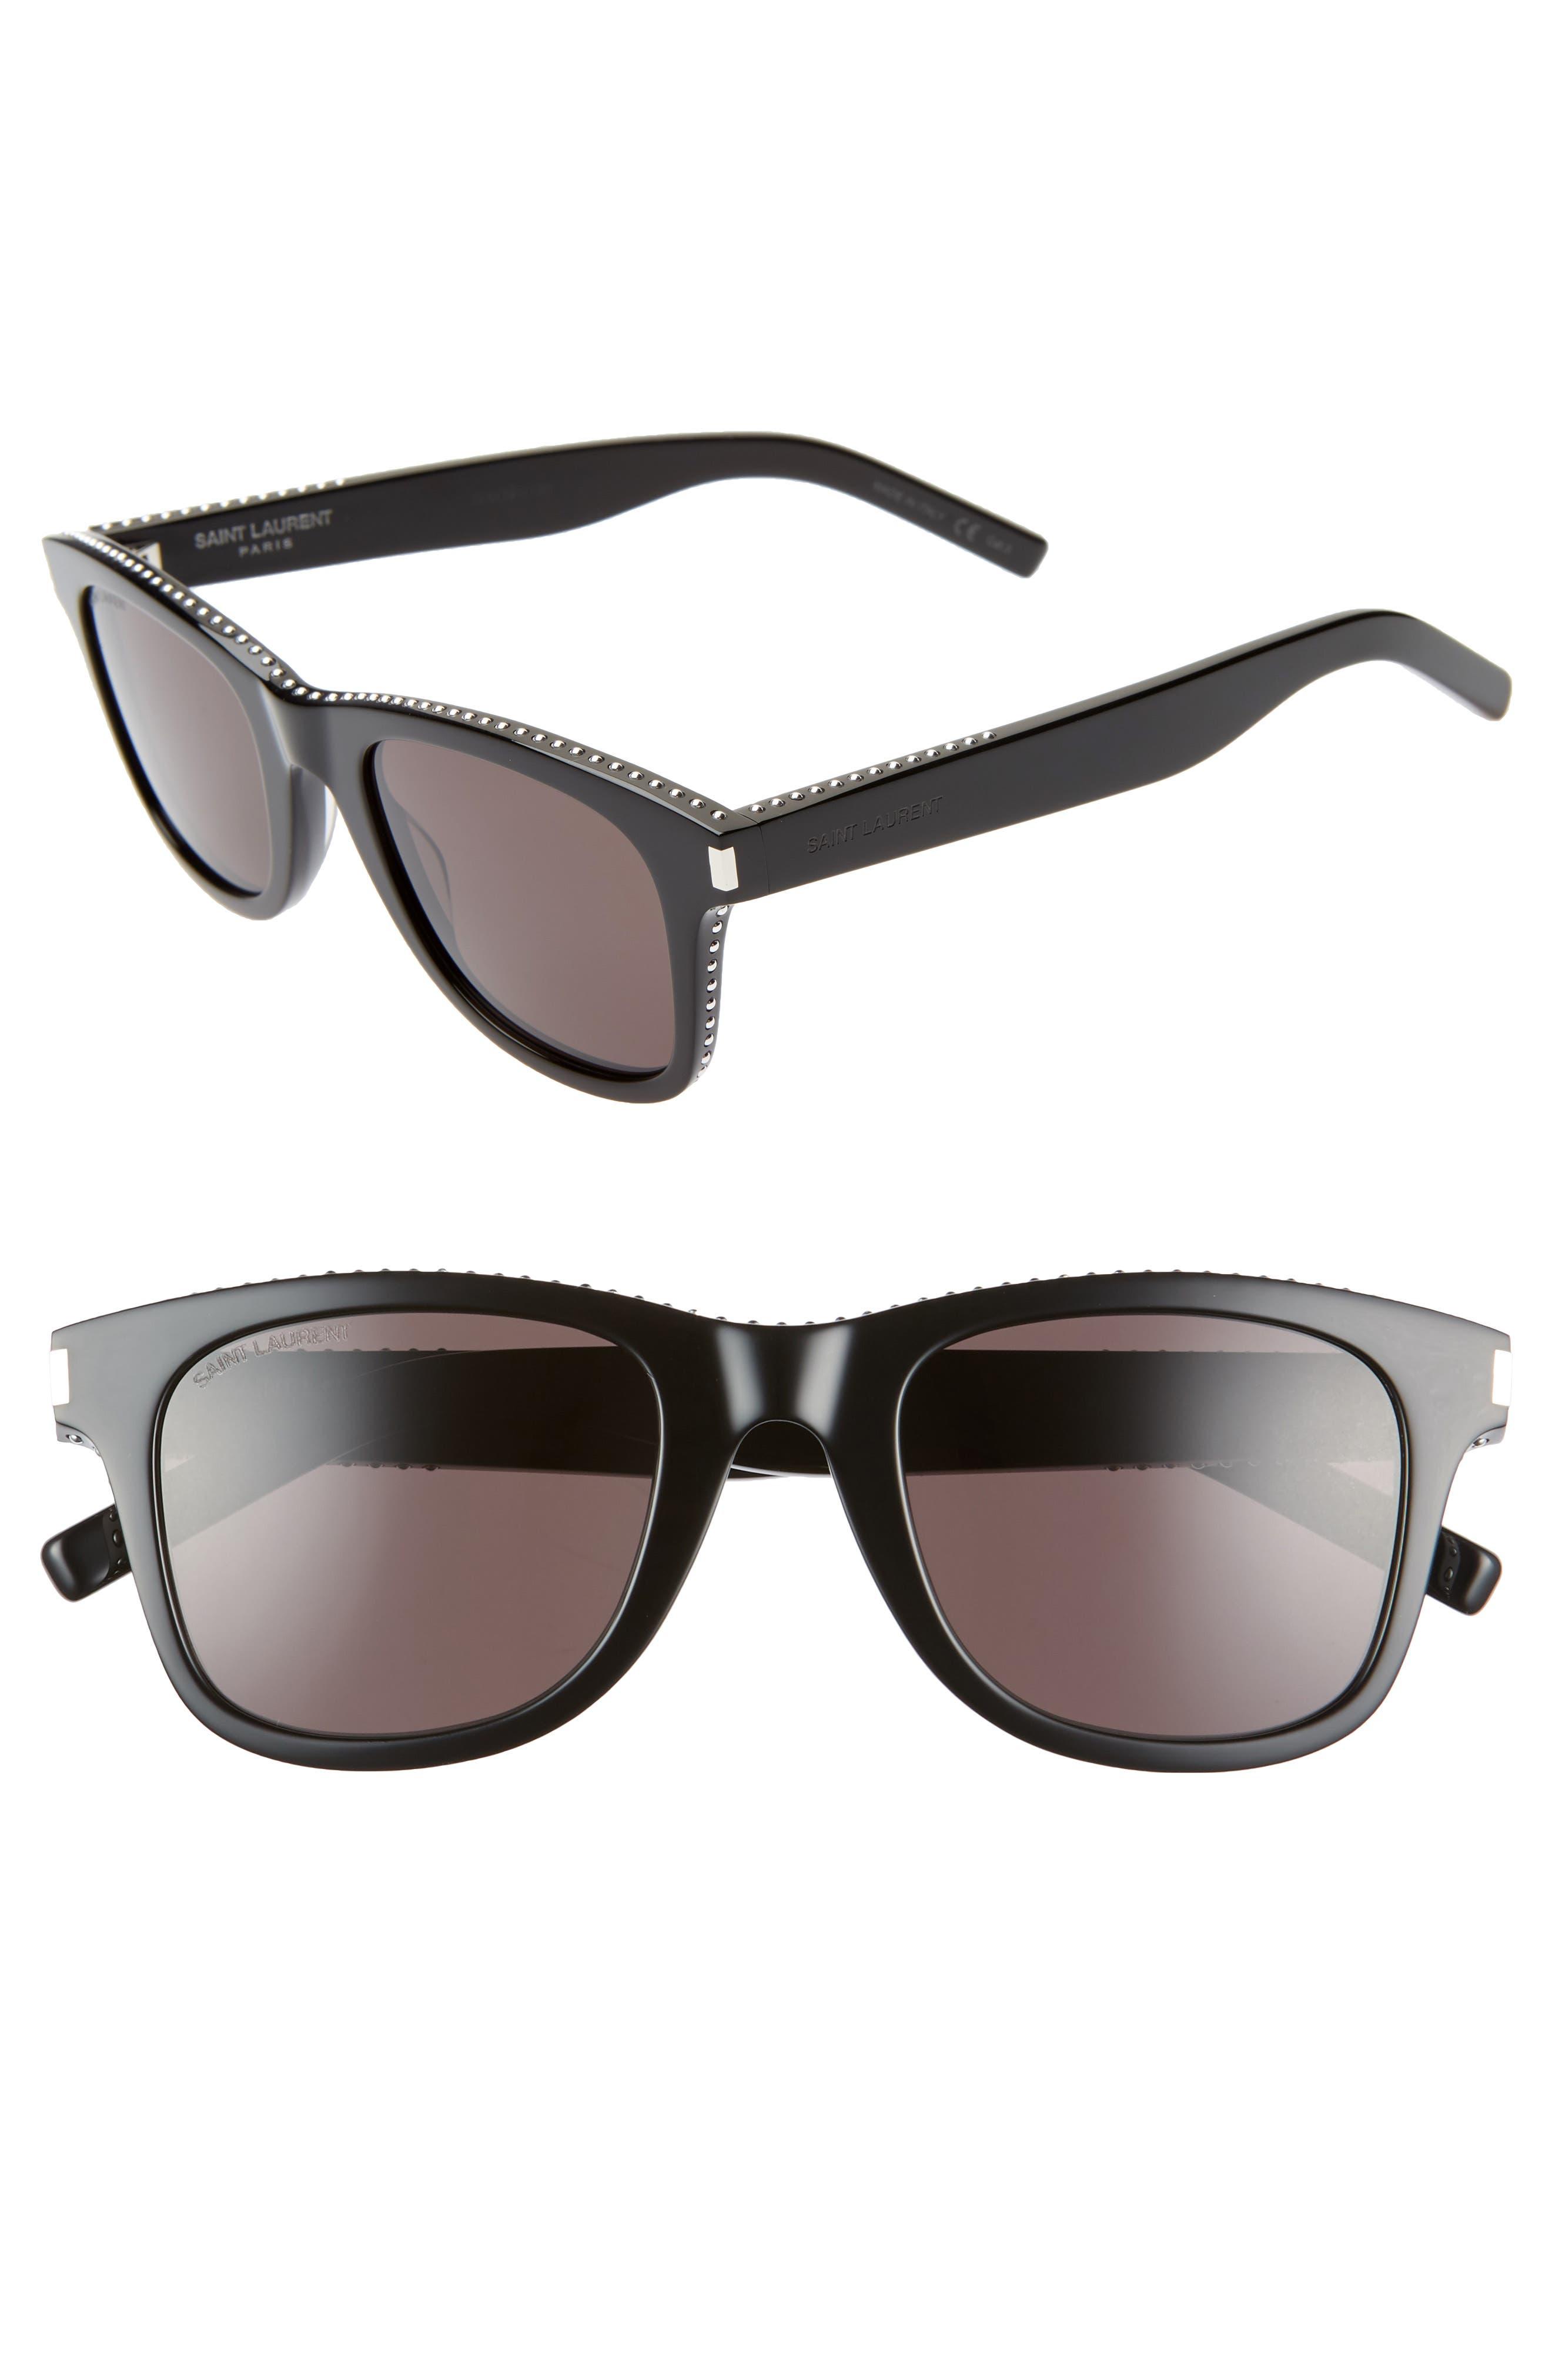 a61936c9380 Men's Saint Laurent Sunglasses & Eyeglasses | Nordstrom